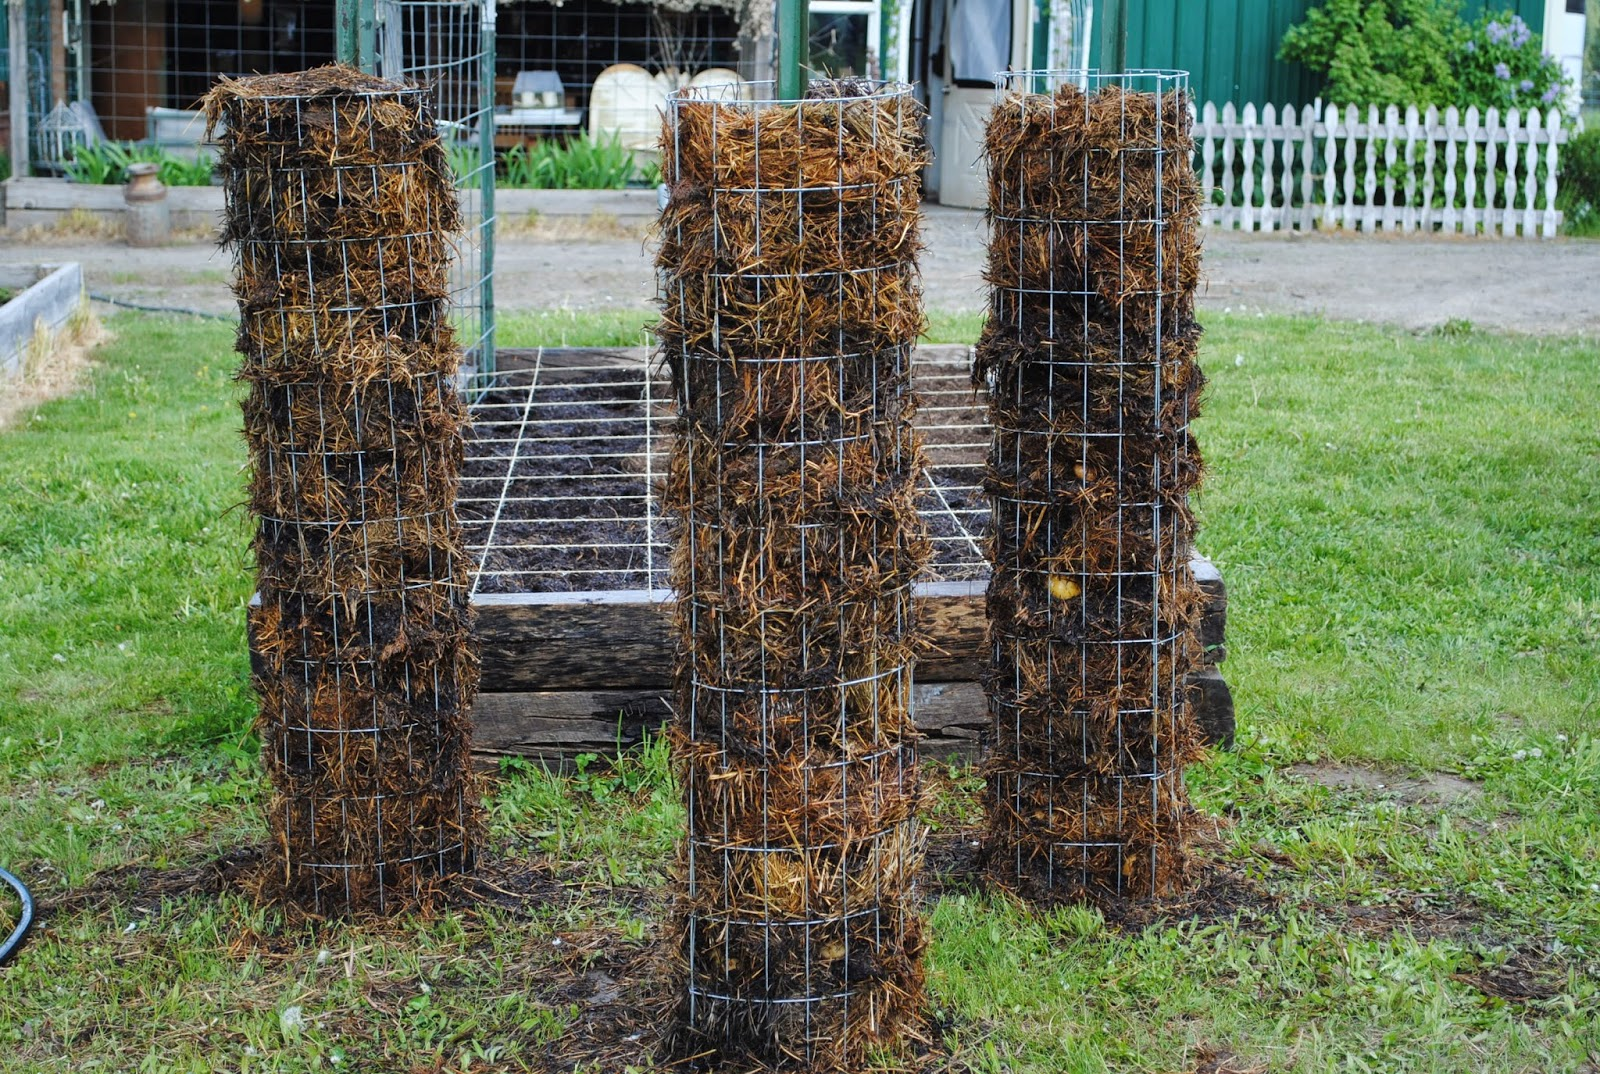 Freshly installed potato towers